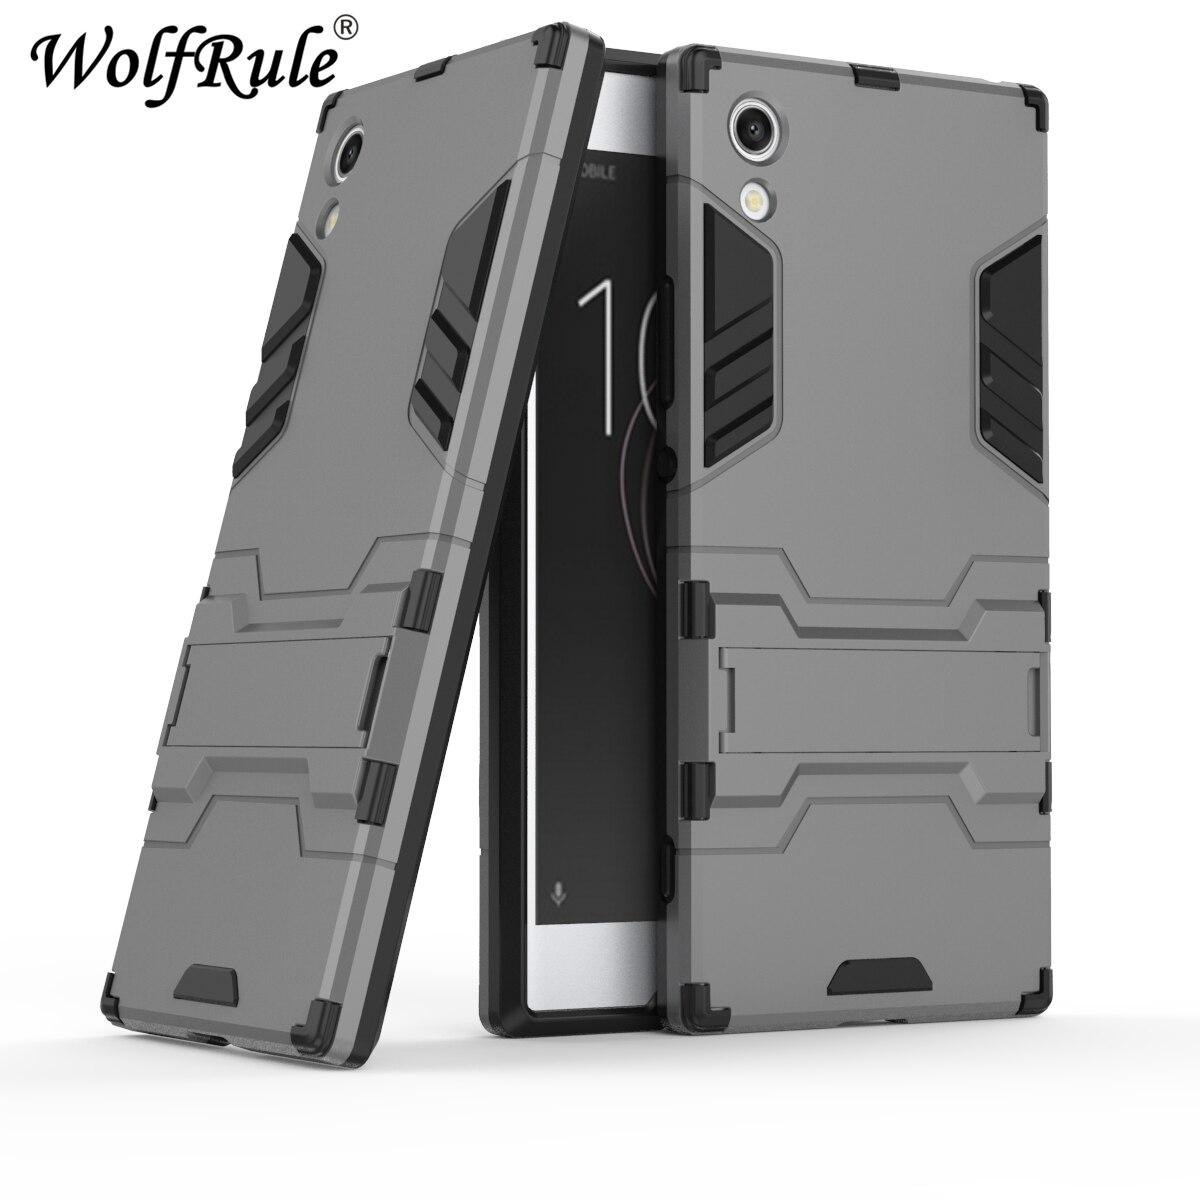 For Cover Sony Xperia XA1 Case for Sony Xperia XA1 Silicone Rubber Robot Armor Hard Back Phone Cover Case for Sony Xperia XA1